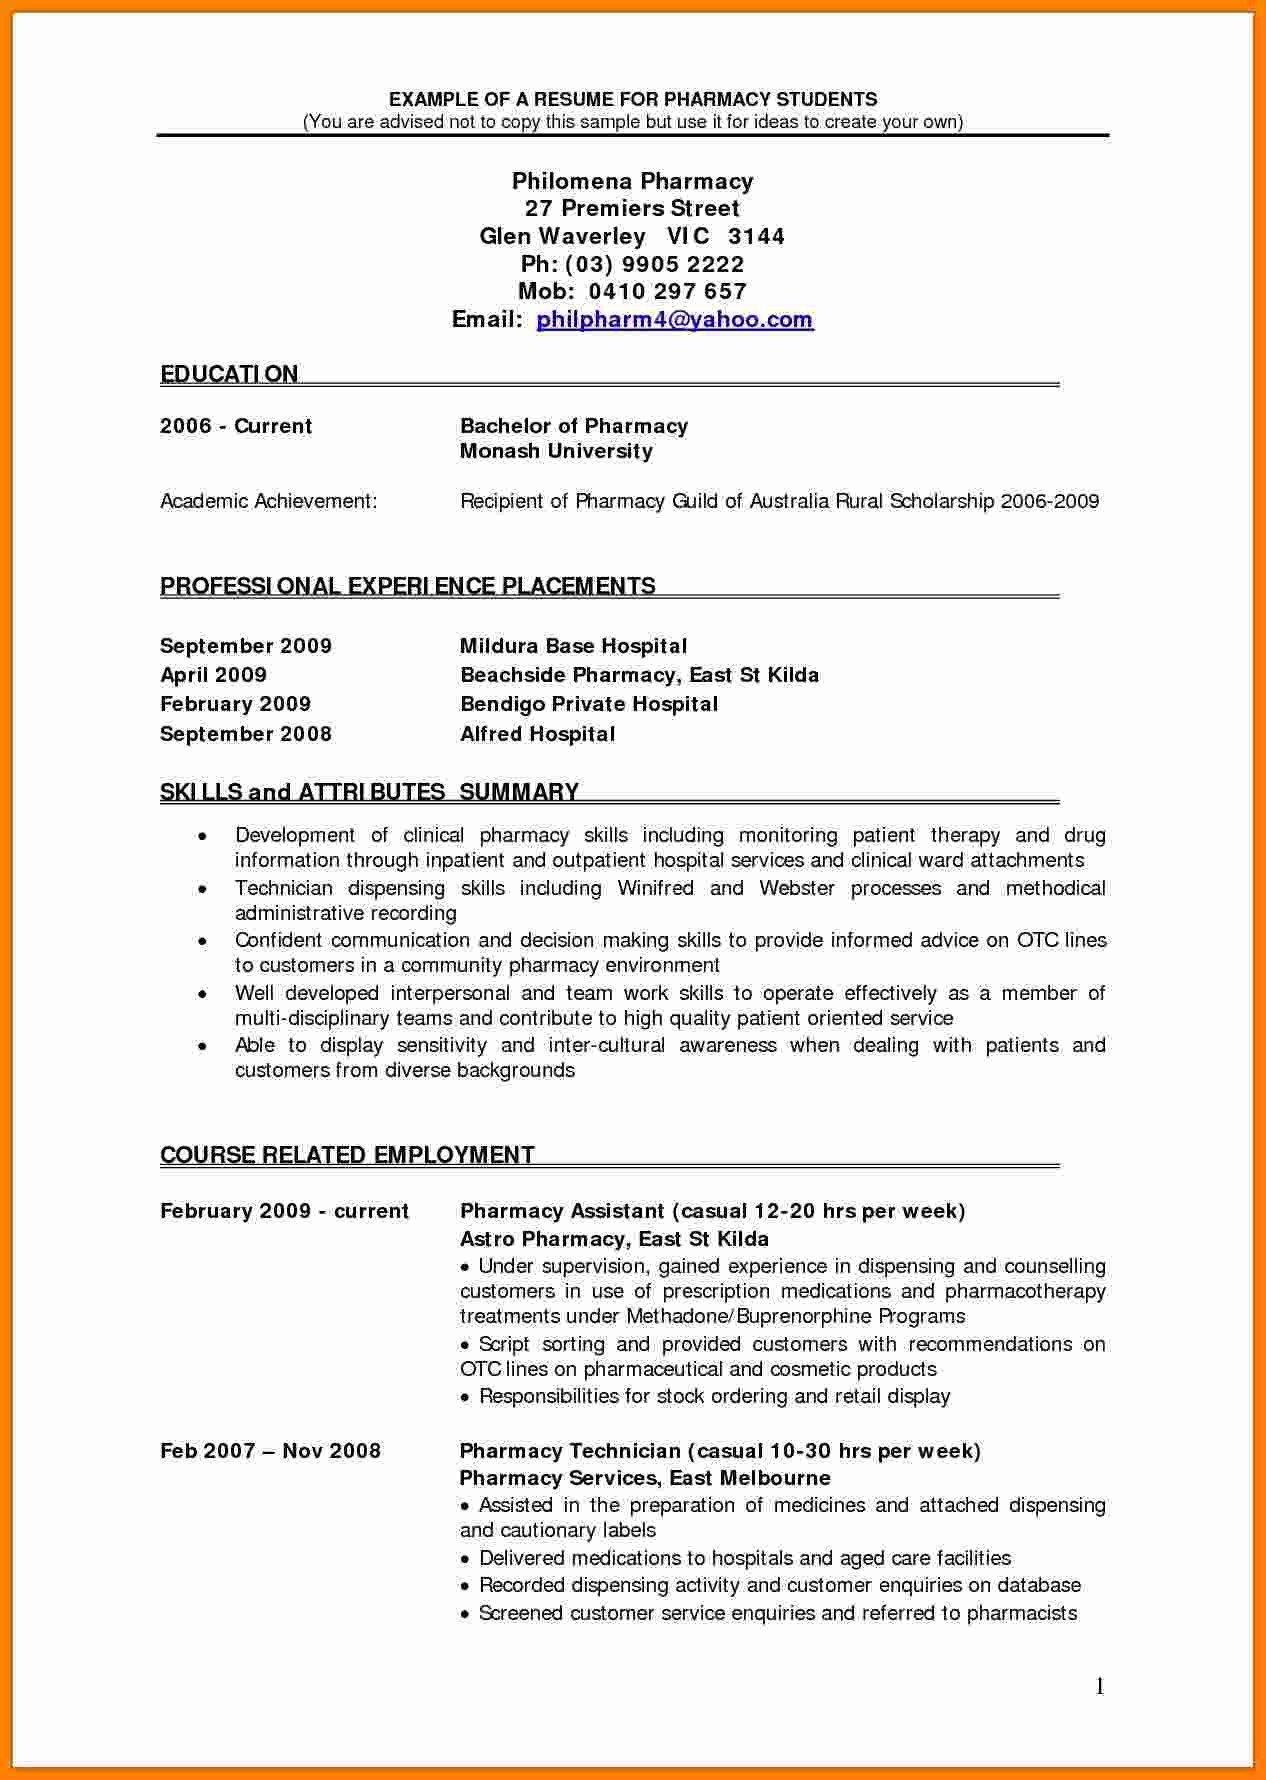 Pharmacist Curriculum Vitae Template 5 Cv Pharmacist Example